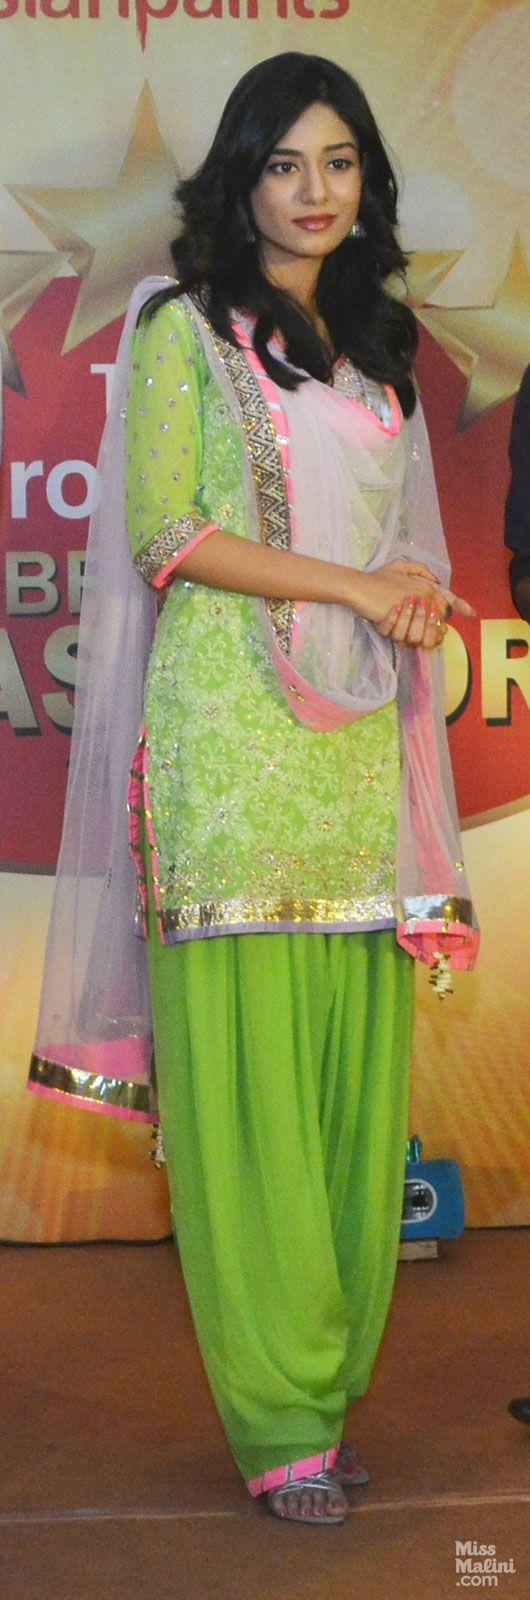 Amrita Rao in Kanika Kedia Patiala Suit